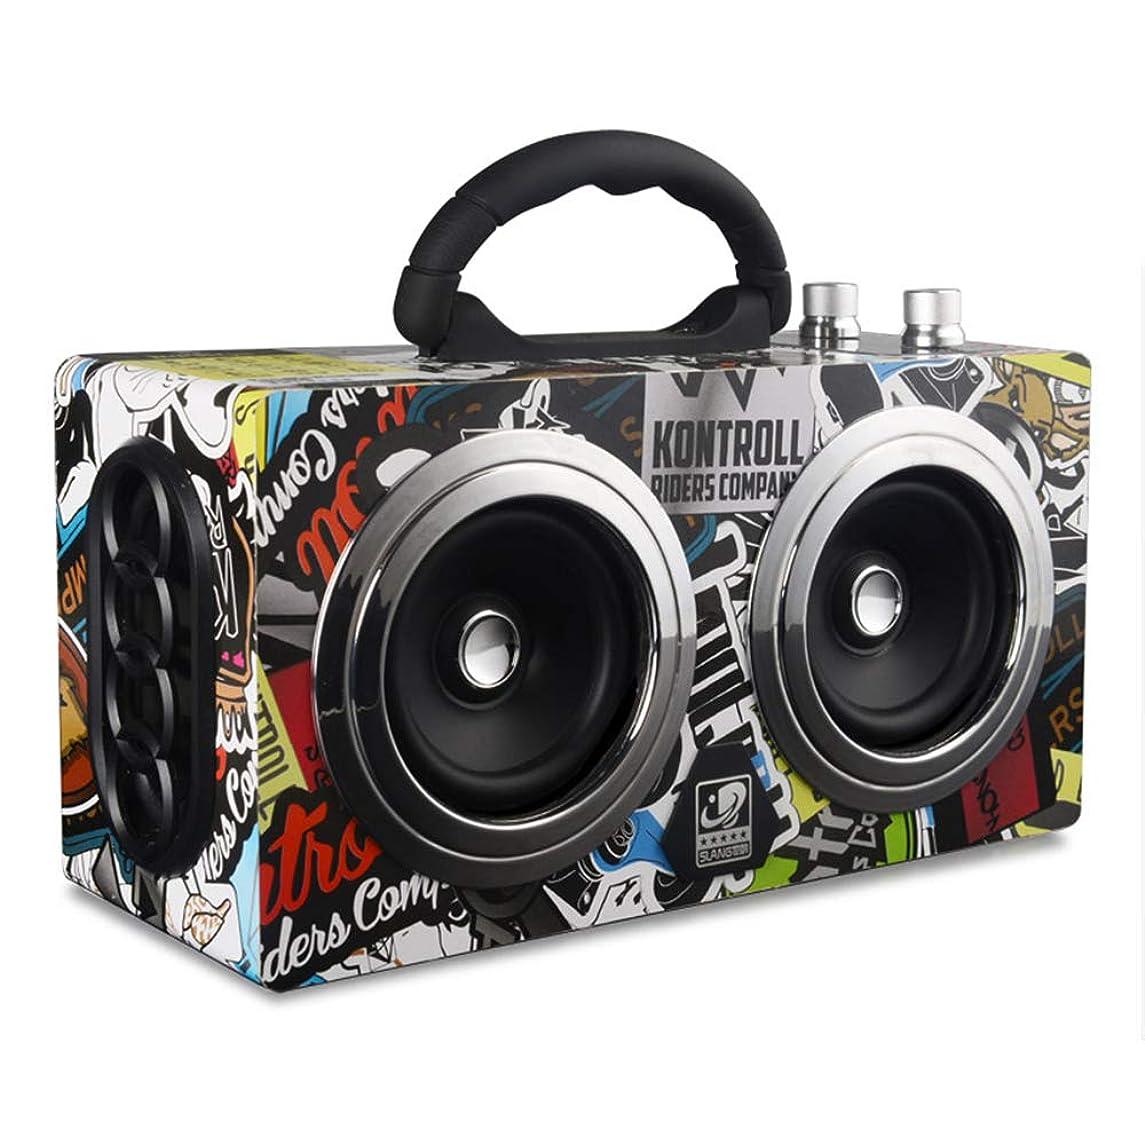 ZUKN Wireless Wooden Bluetooth 4.0 Speaker 20W Bass Portable Mini Outdoor Stereo Subwoofer Retro Speaker with FM Radio Support TF